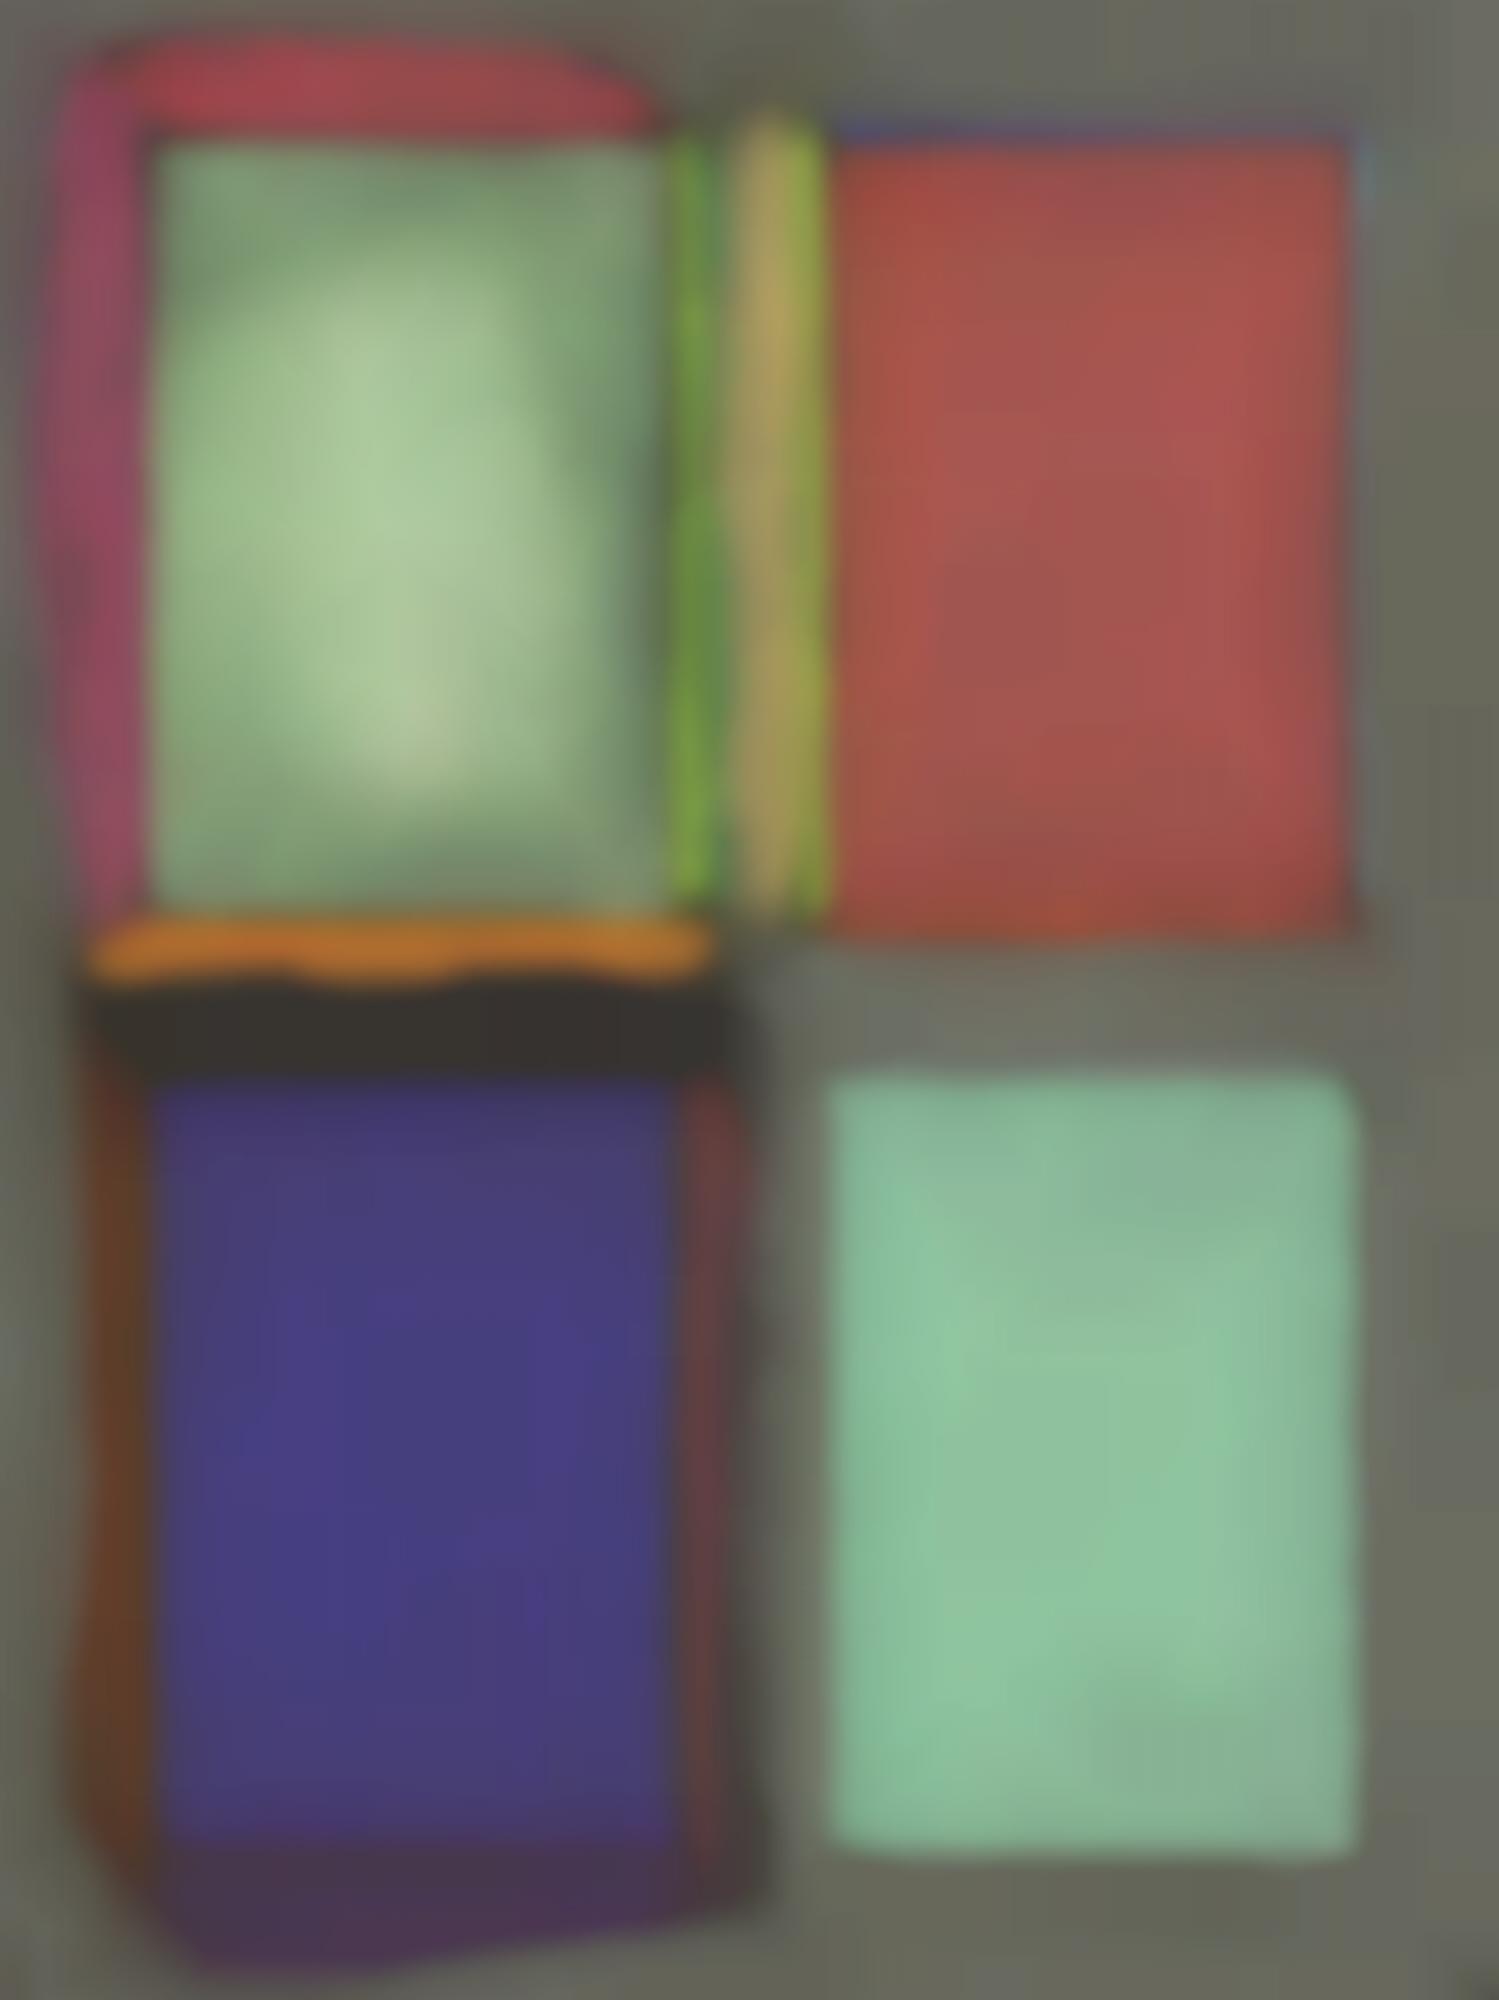 Lucas Samaras-Untitled (Window) #6-1965